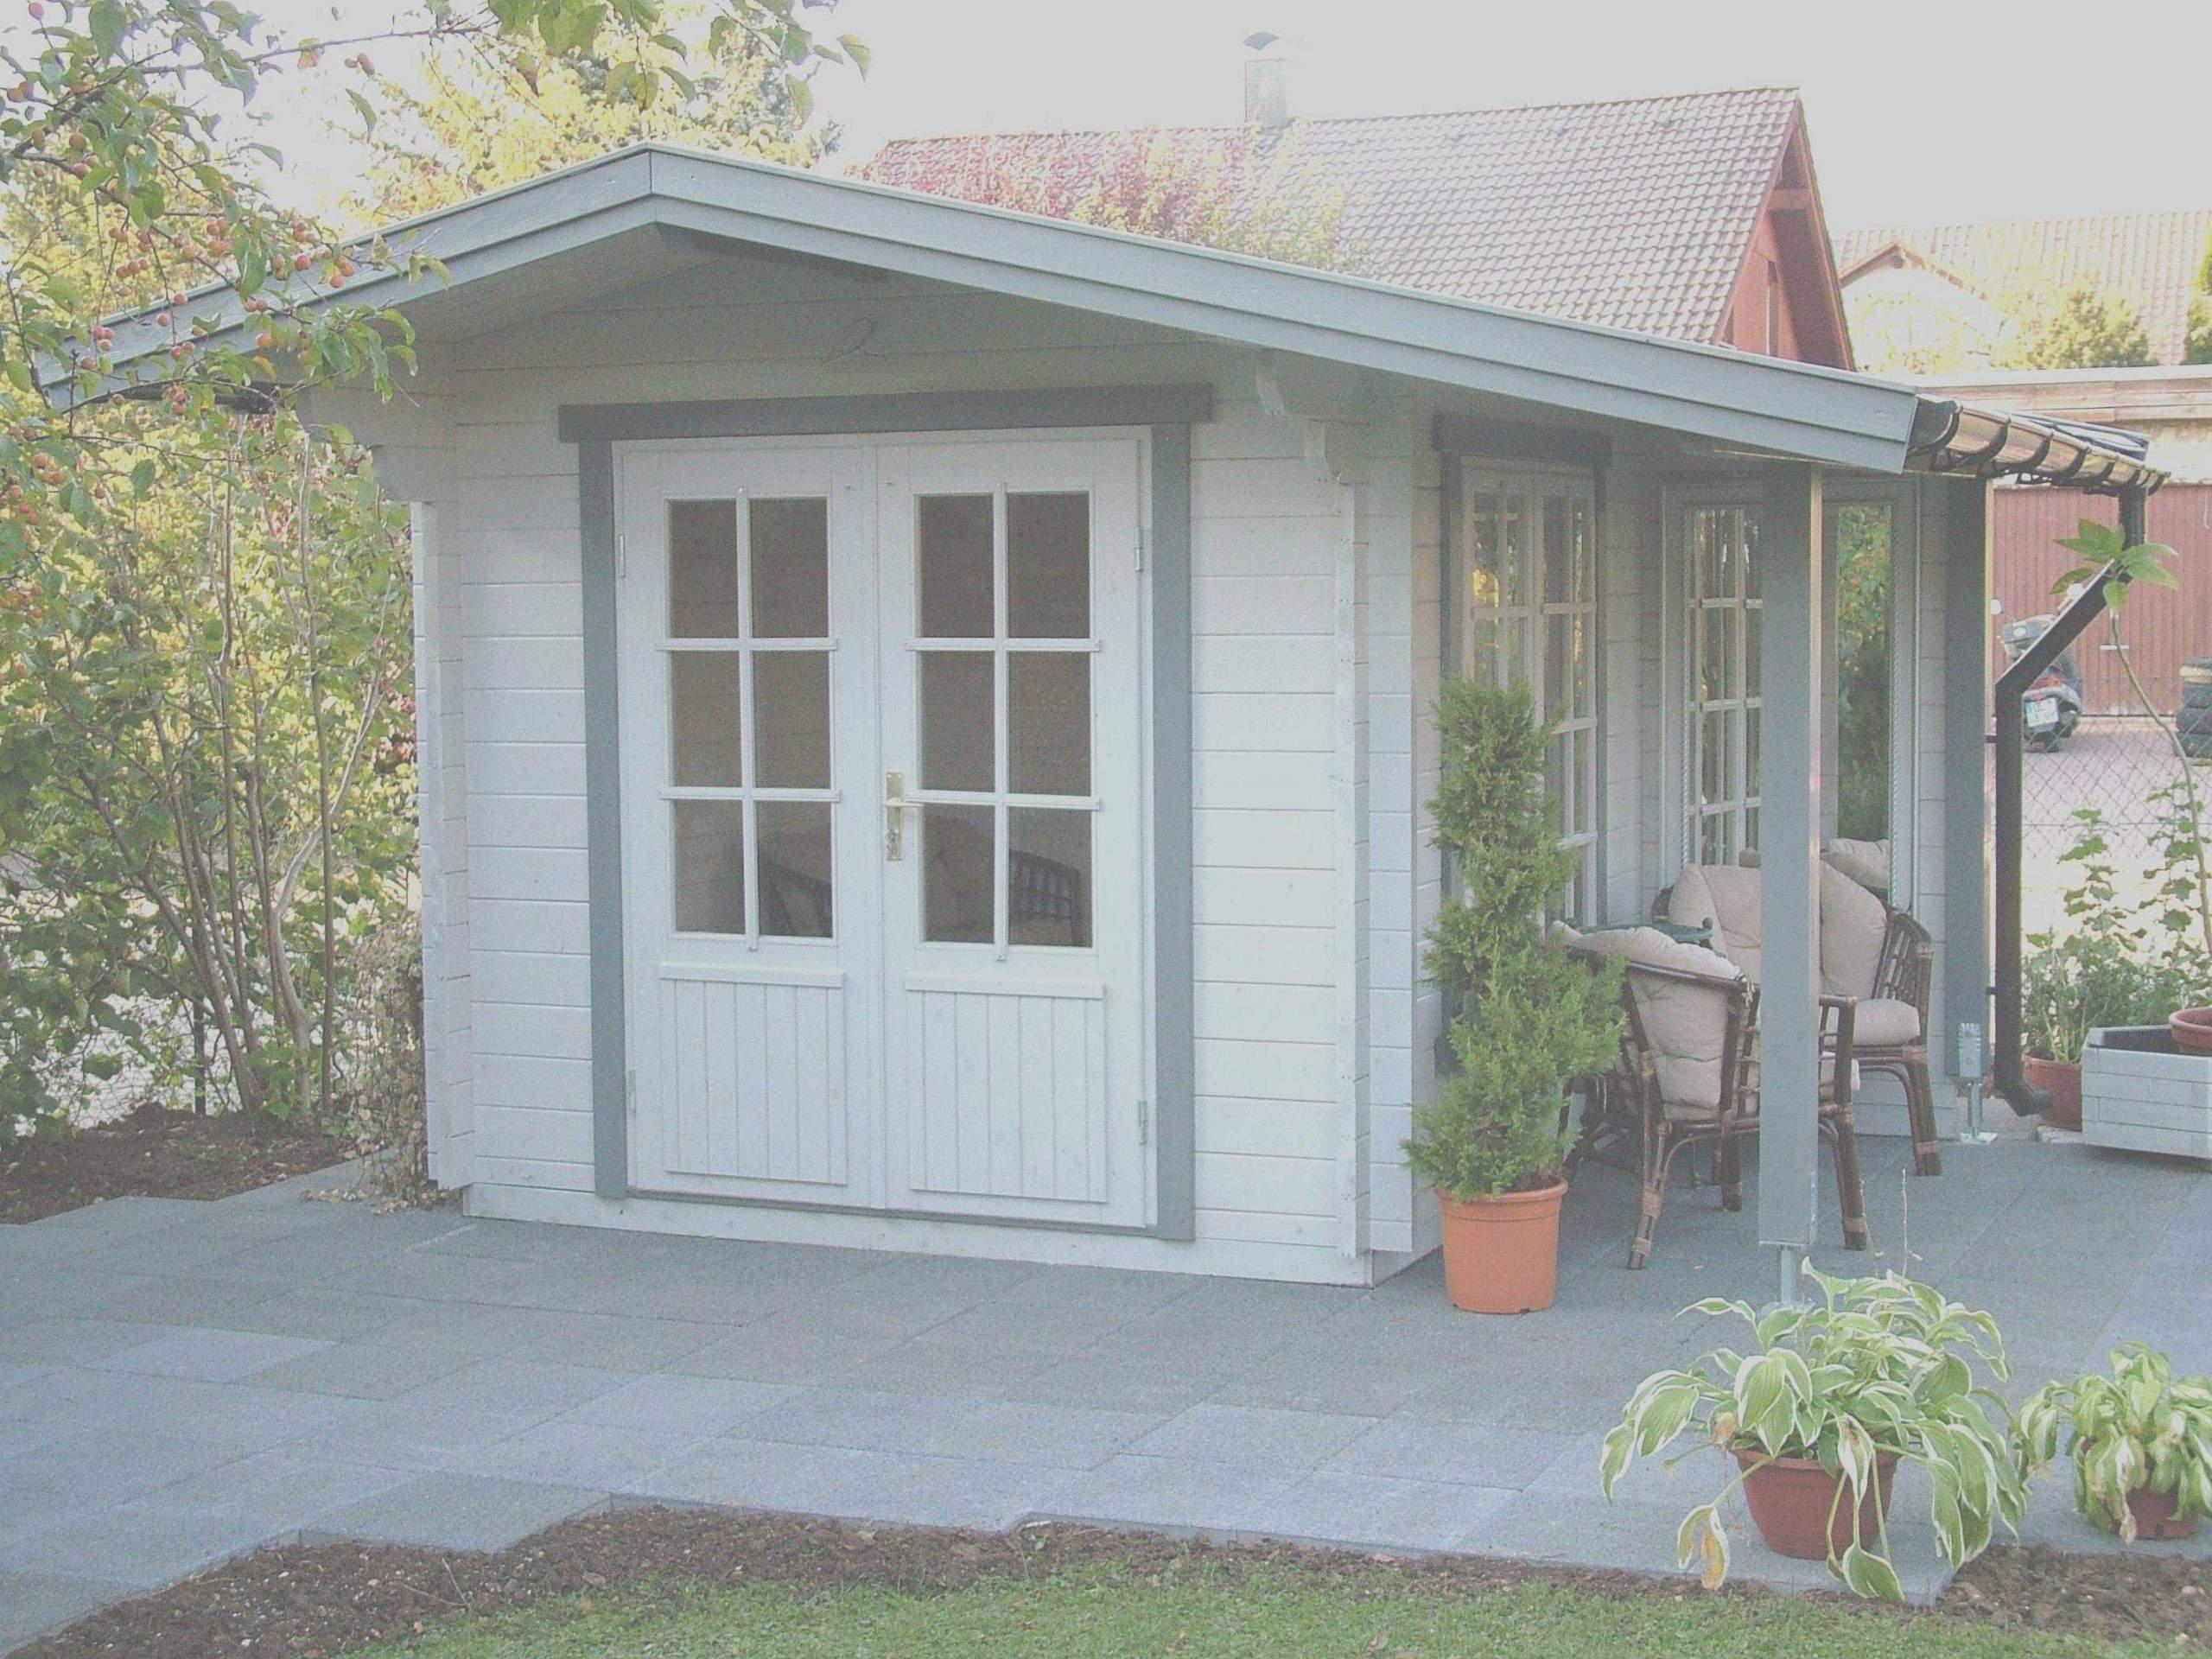 gartenhaus inkl aufbau schon gartenhaus mit veranda luxus idee veranda terrasse pure i of gartenhaus inkl aufbau scaled